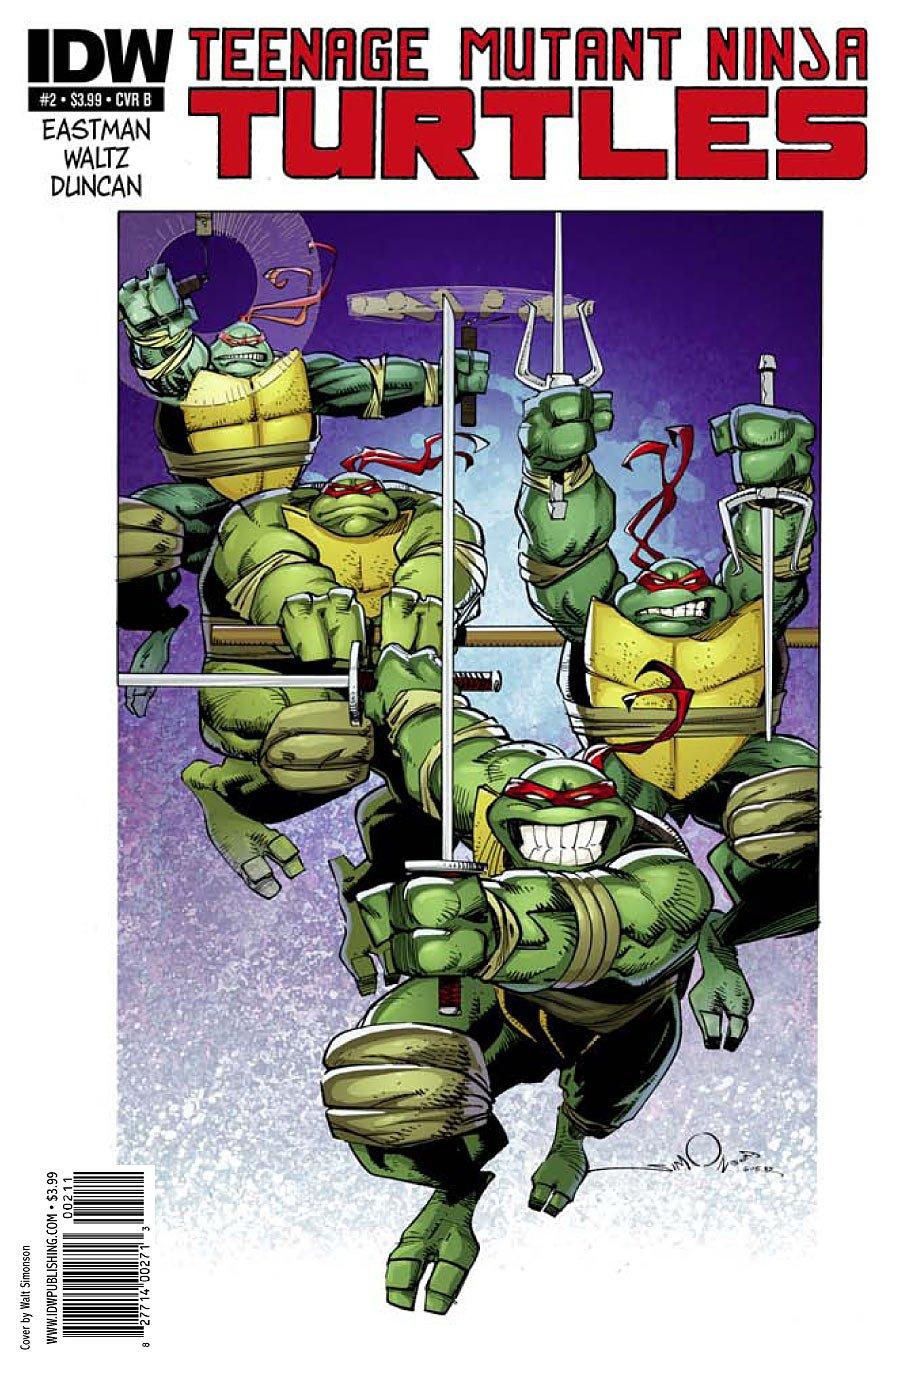 Teenage Mutant Ninja Turtles #2 Walter Simonson Cover ...